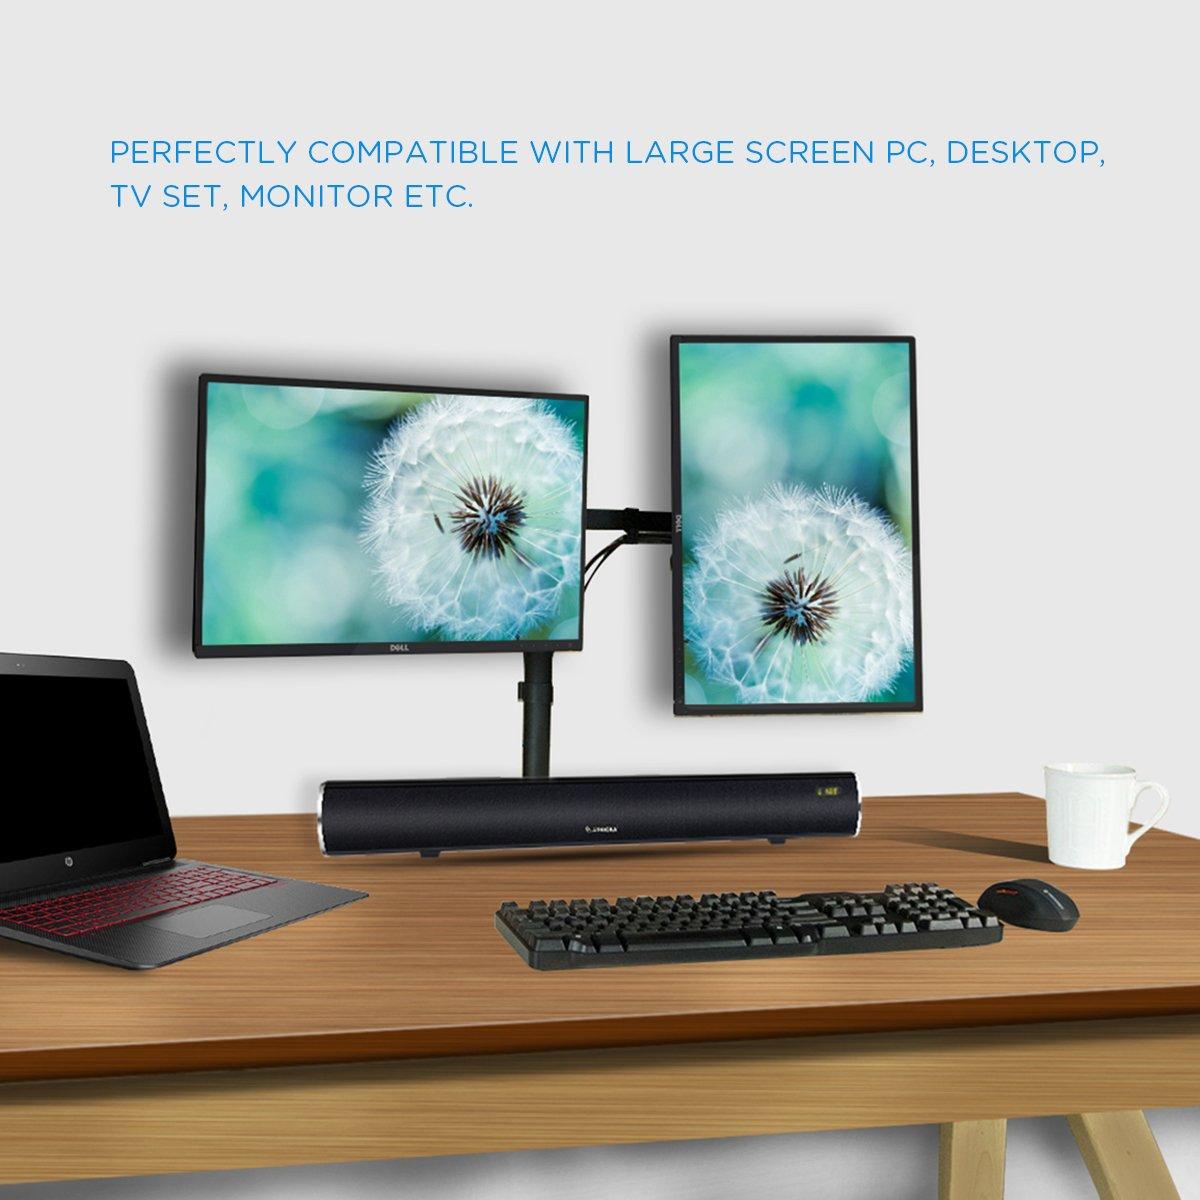 Amazon.com: ARVICKA Home Theater Speaker-Csr Bluetooth 4.0 Fantastic ...